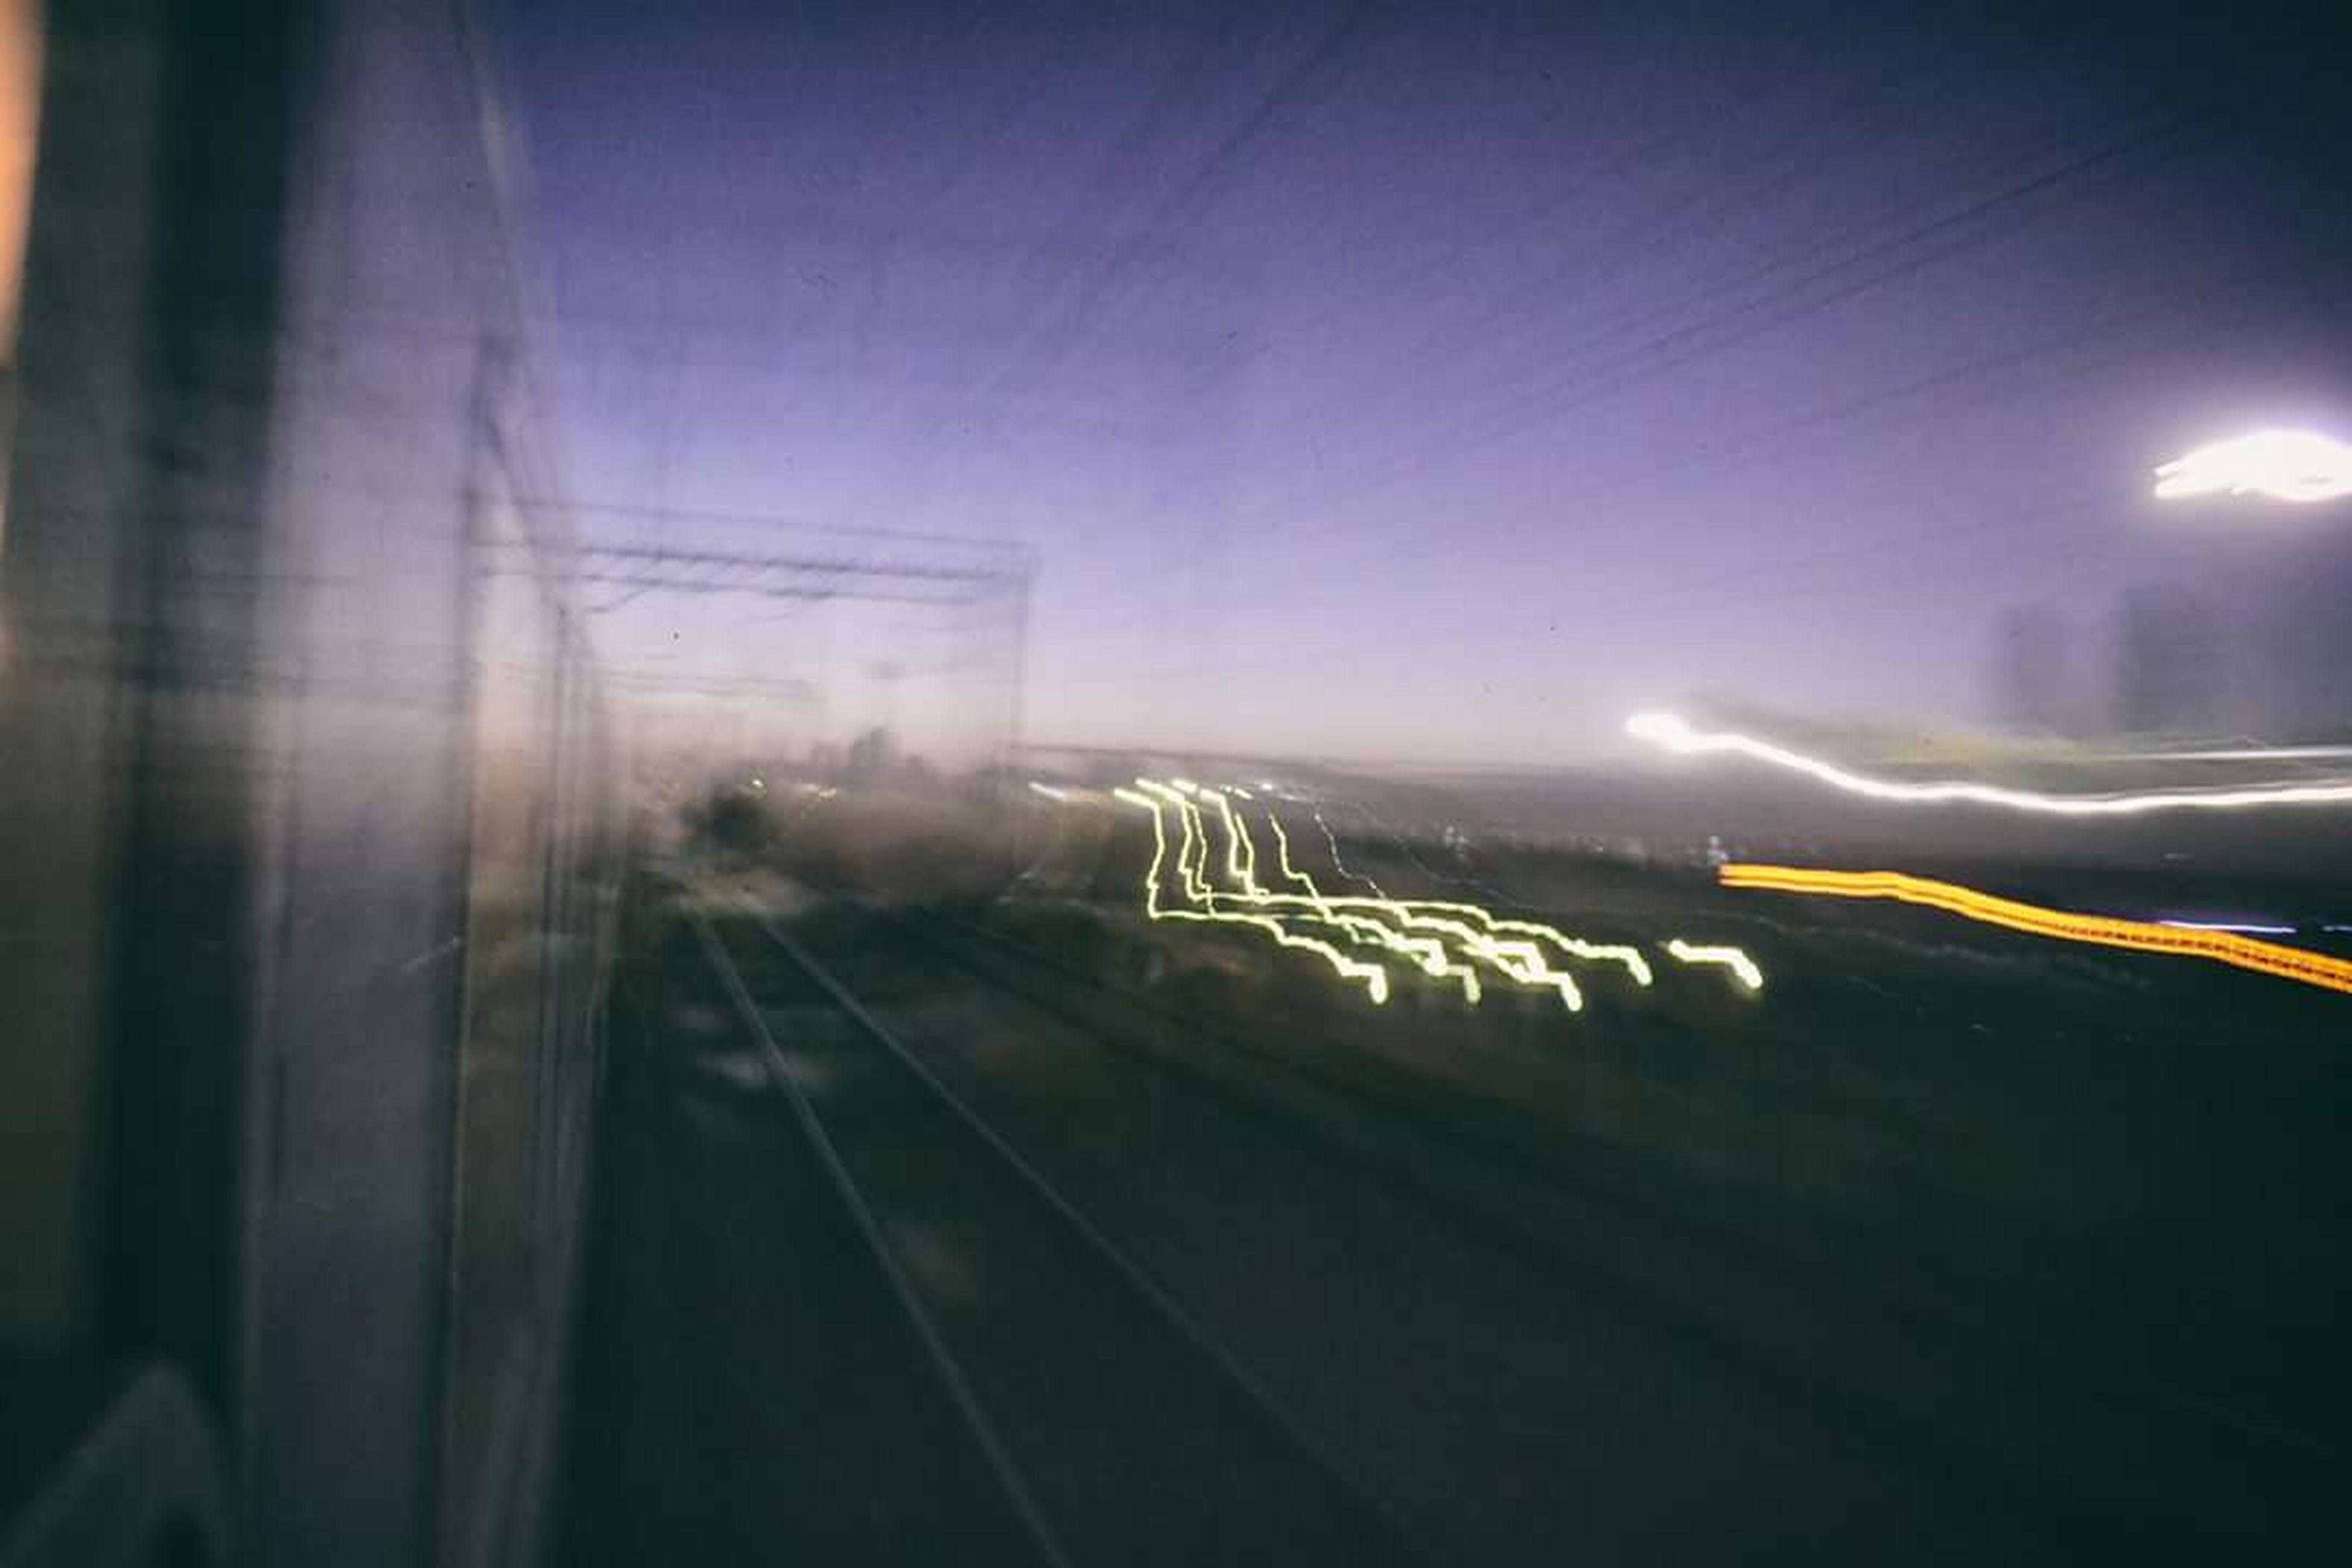 illuminated, night, blurred motion, lens flare, light trail, defocused, light beam, glowing, light, sky